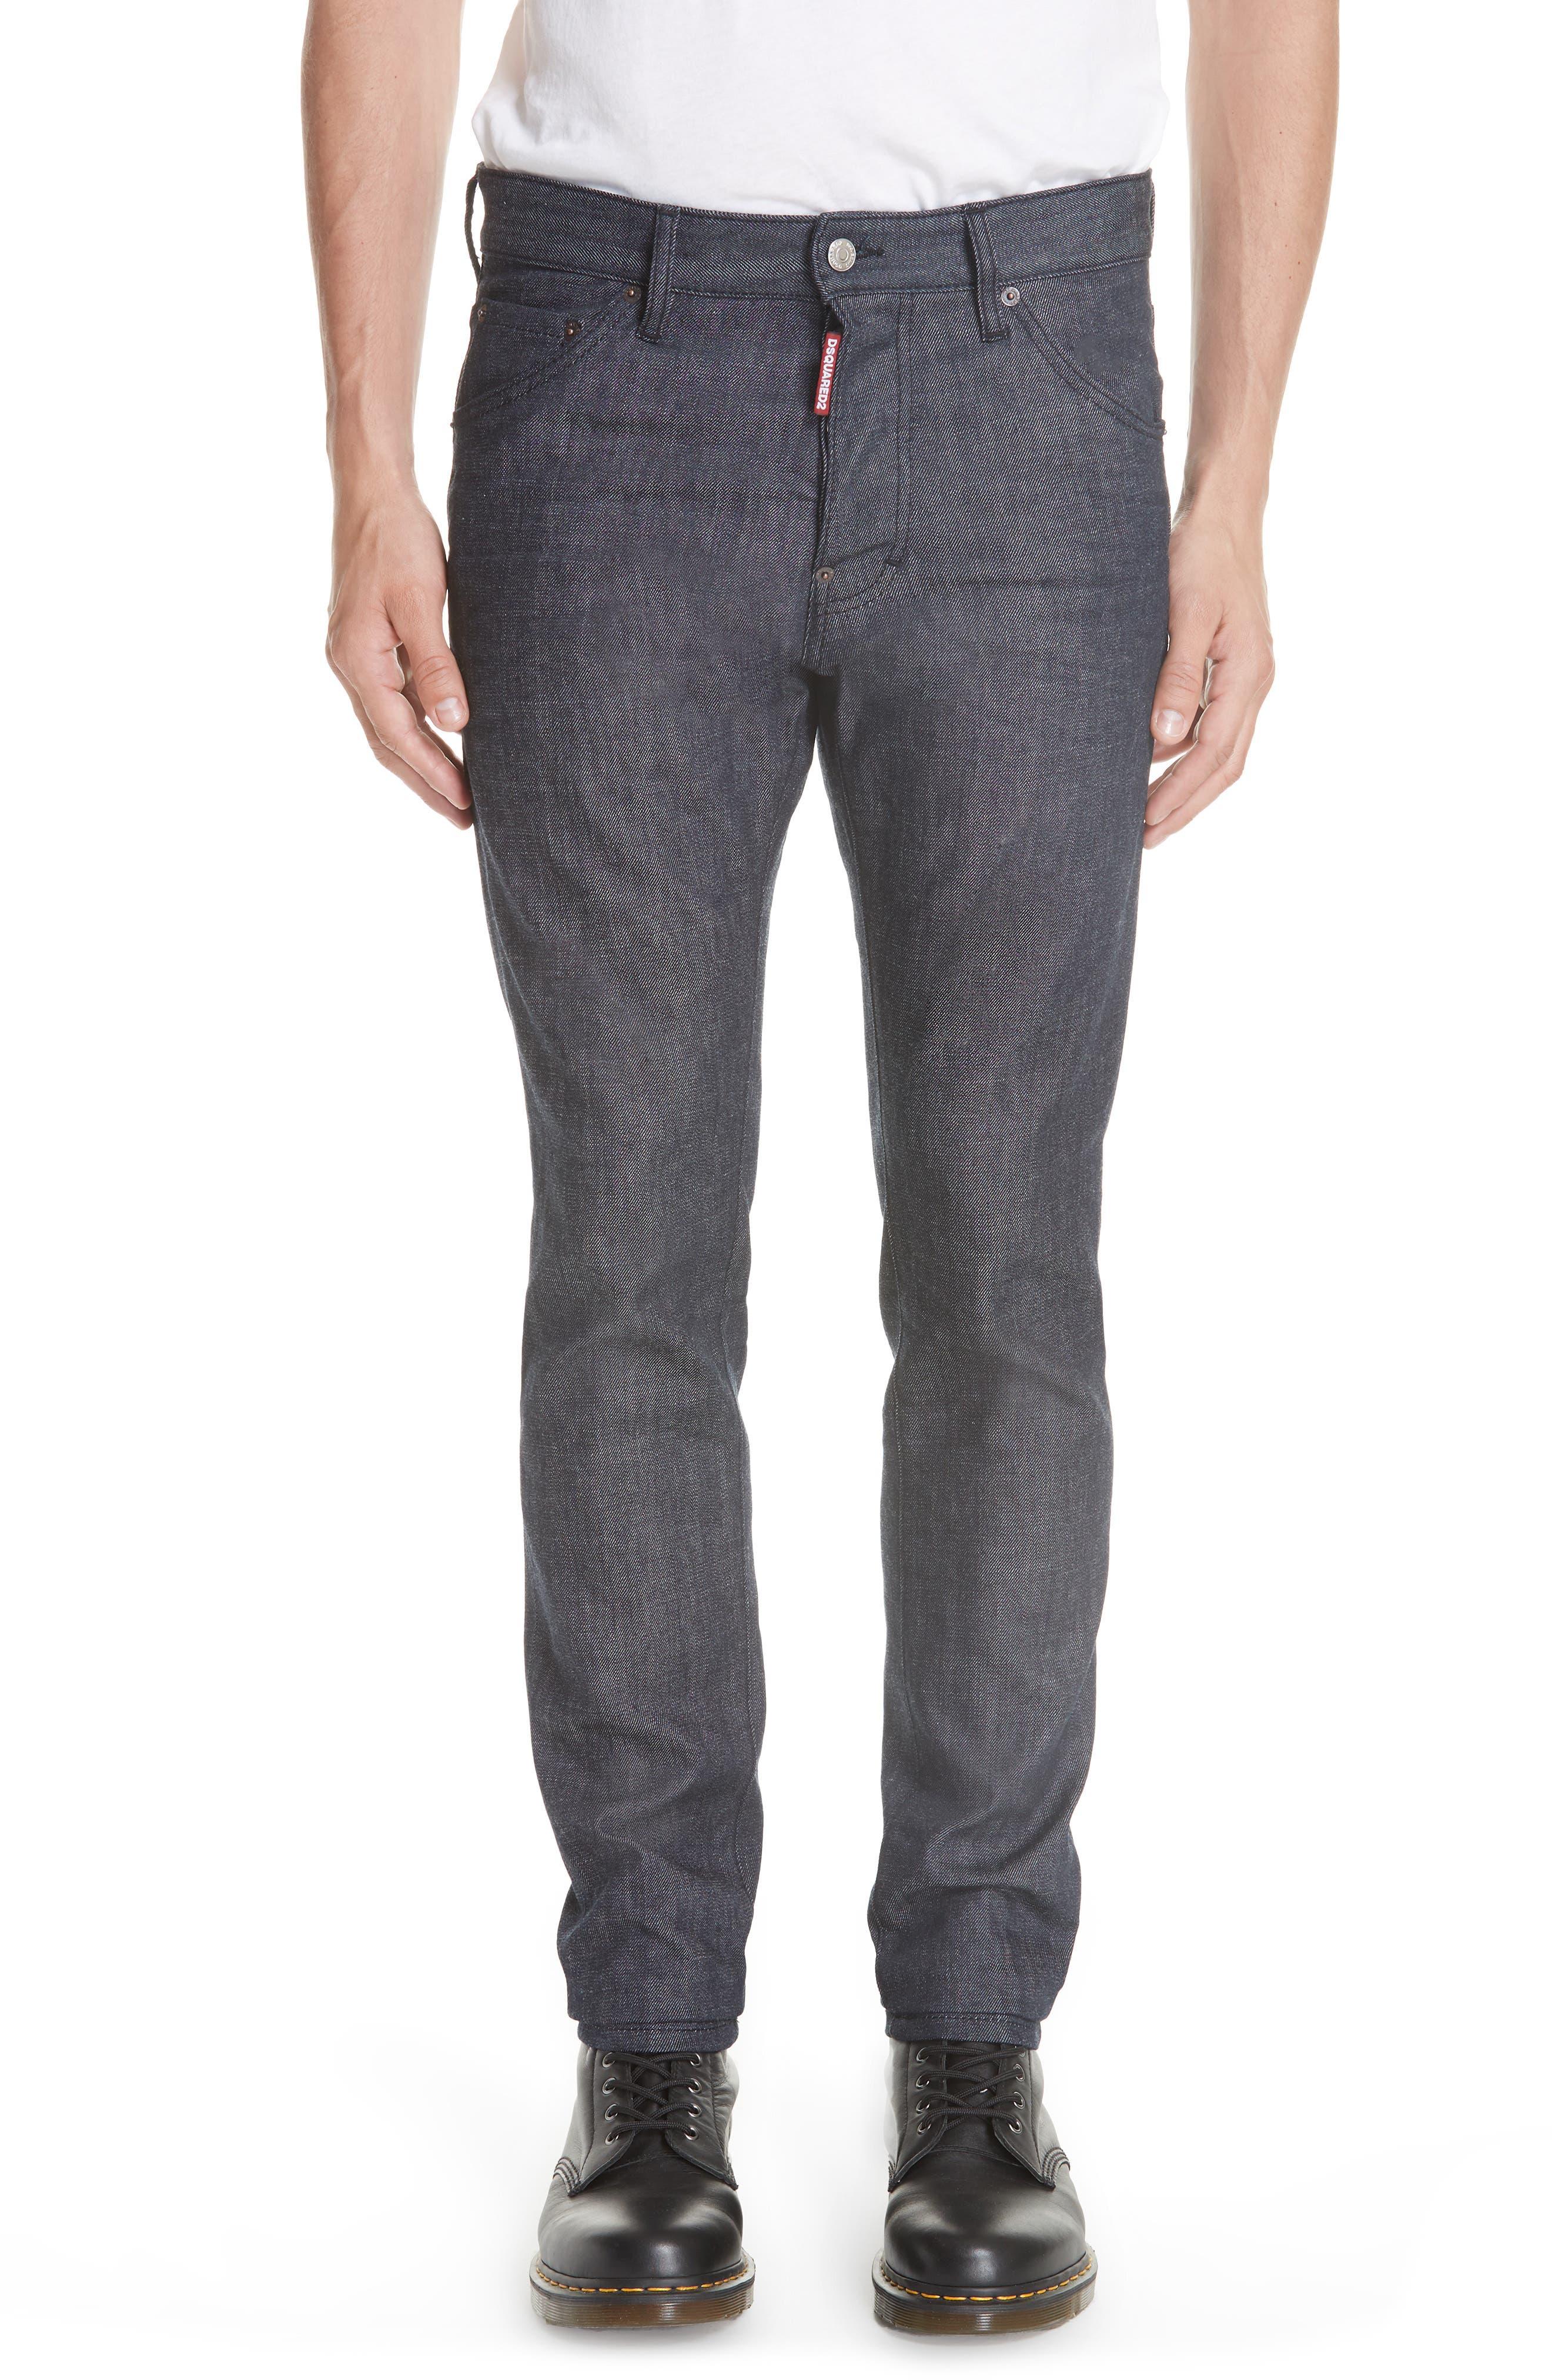 Cool Guy Jeans,                             Main thumbnail 1, color,                             DARK WASH